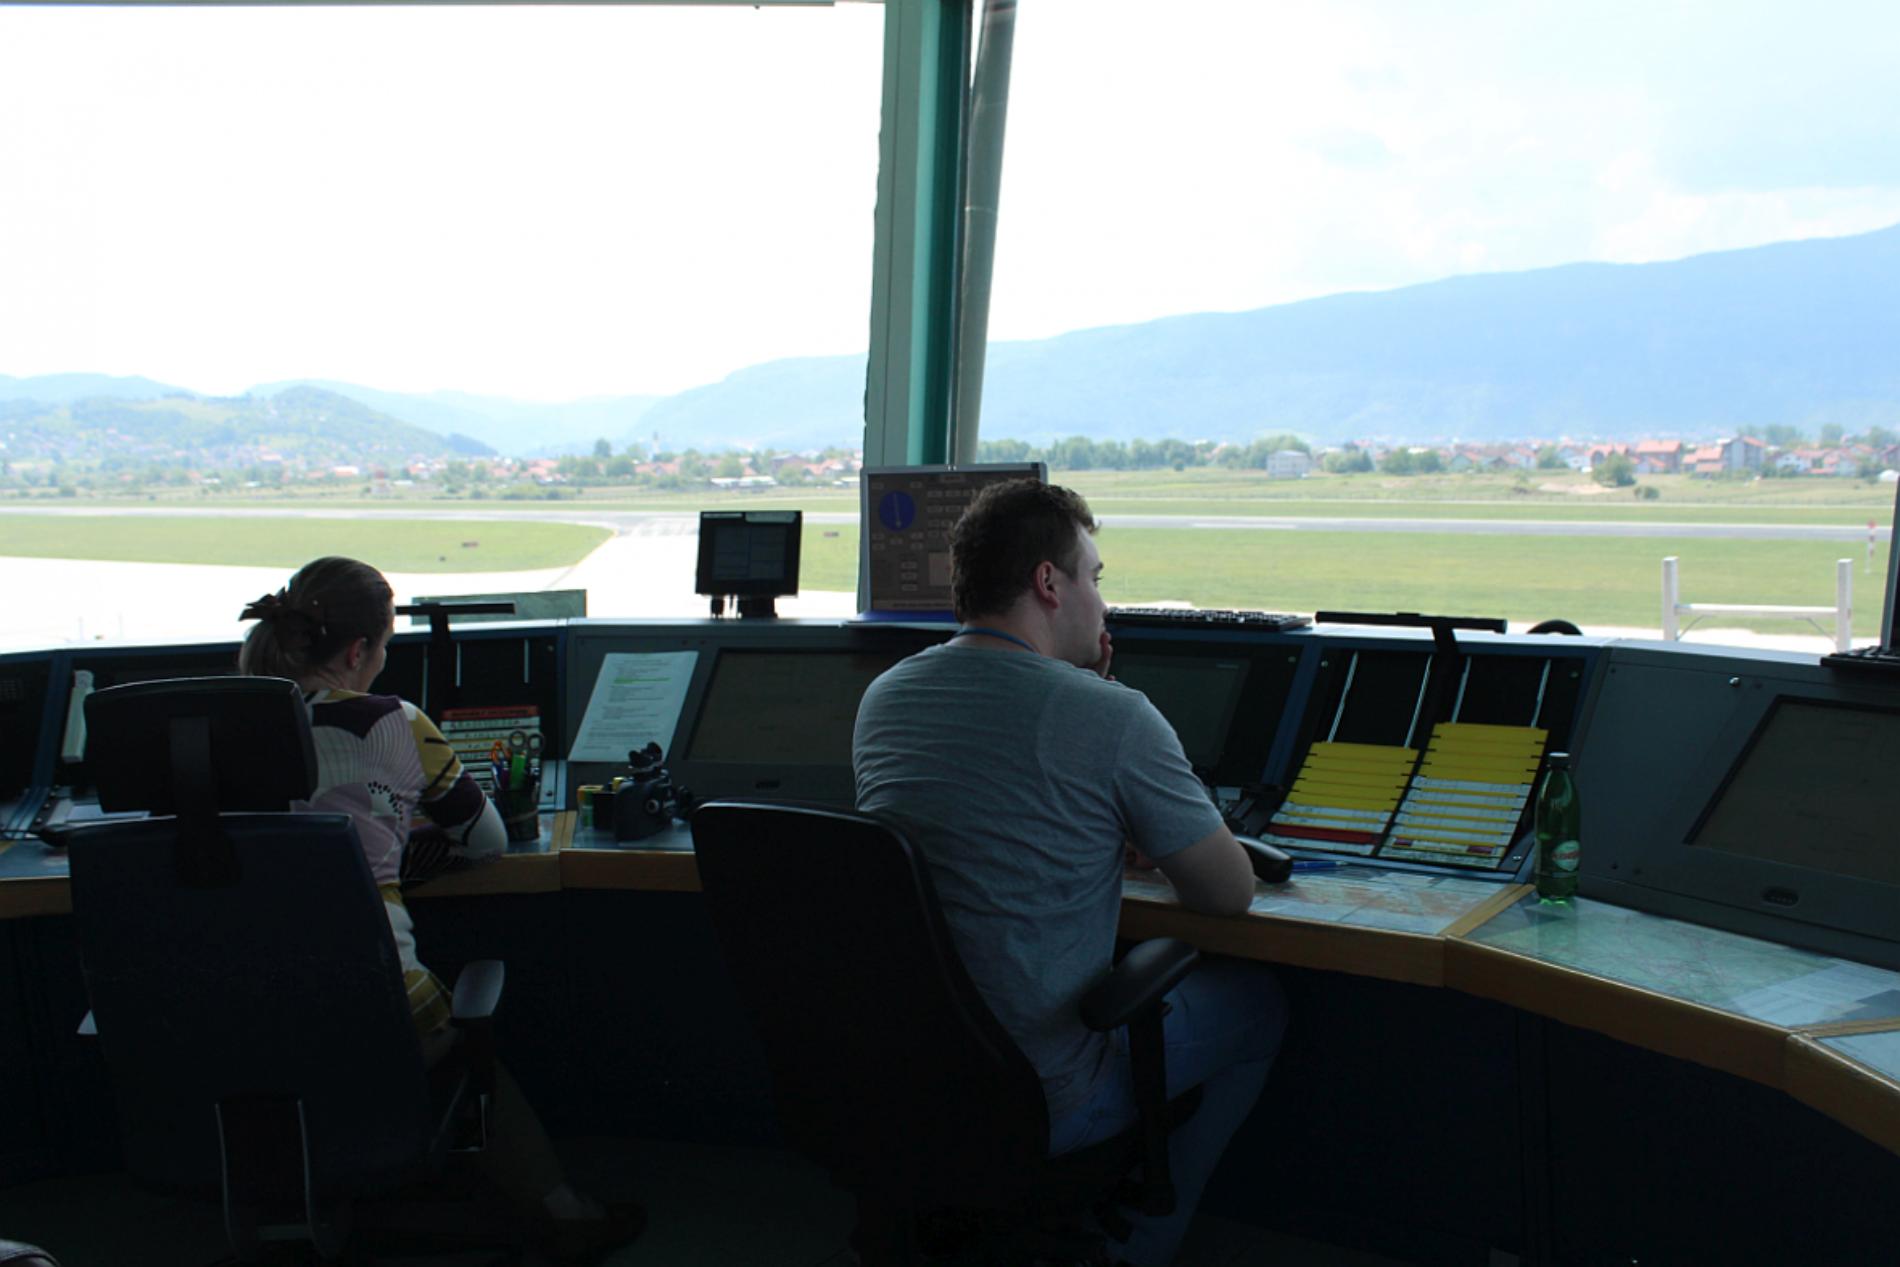 Kontrola bosanskog neba donosi zaradu: 71 milion maraka na osnovu preleta aviona